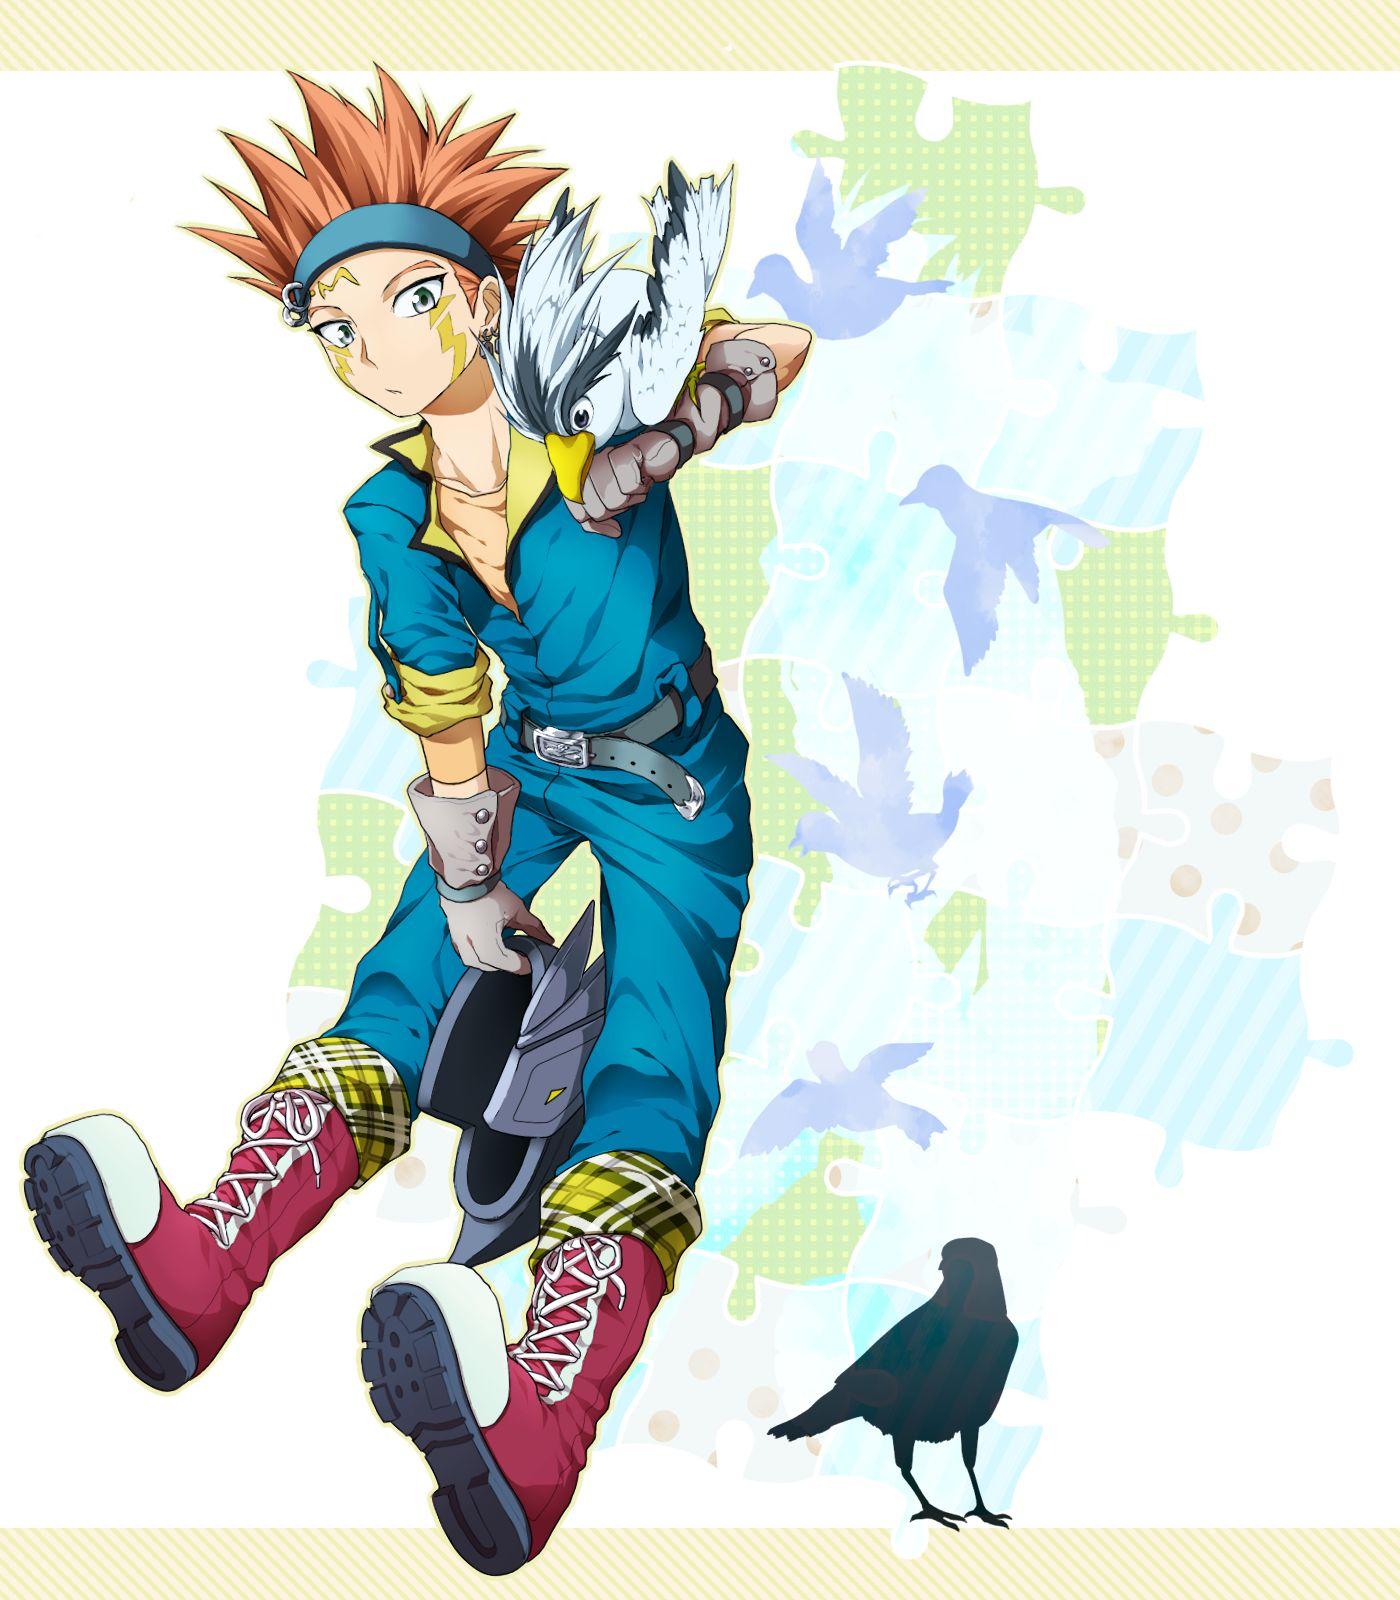 Pin by Kaito Tenjo on Crow Hogan Anime, Yugioh, Anime boy